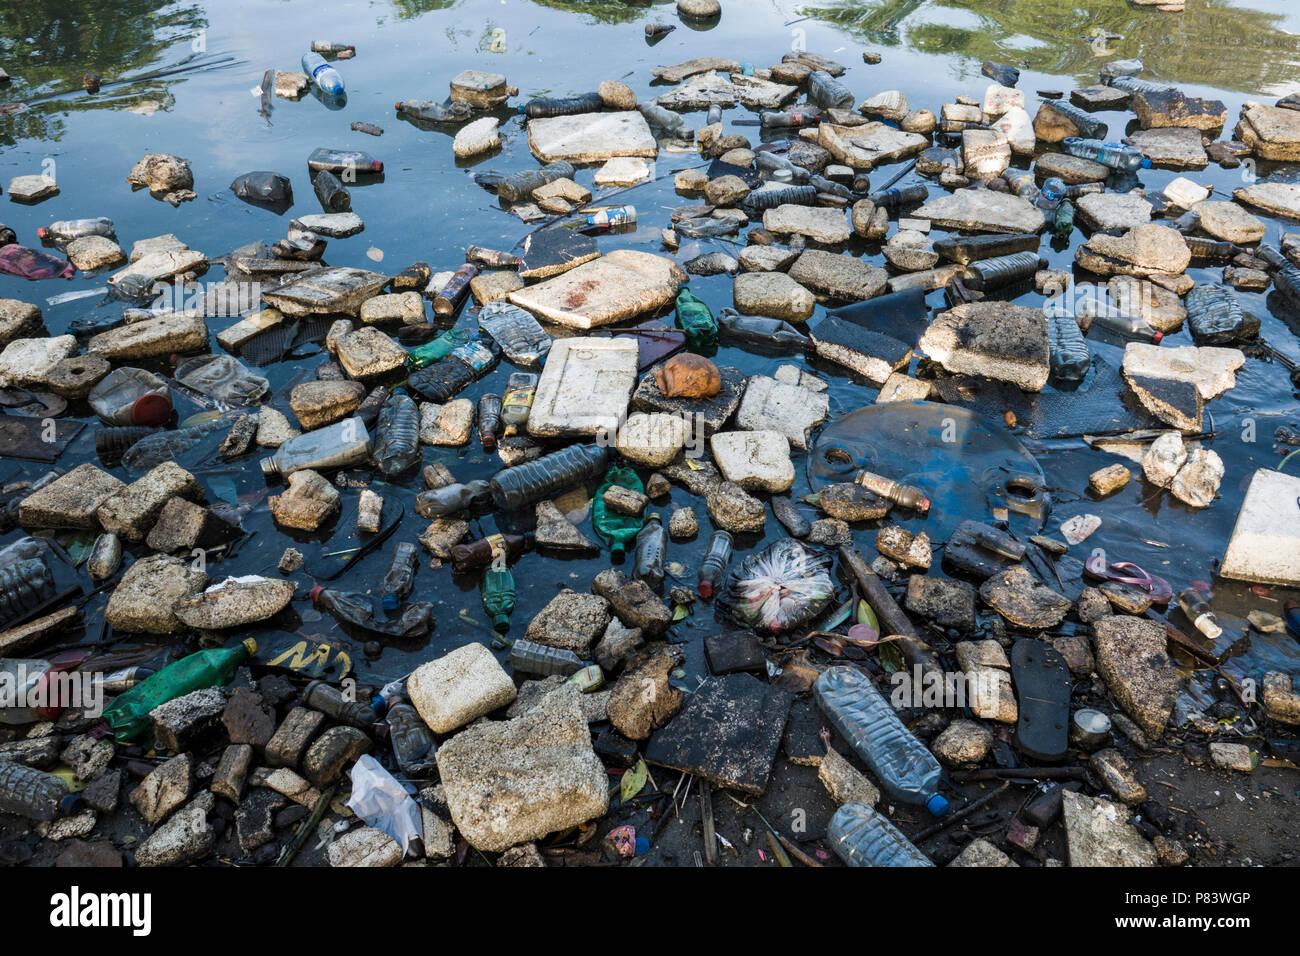 Plastic bottles, polystyrene and other garbage floating in ocean in Negombo, Sri Lanka Stock Photo